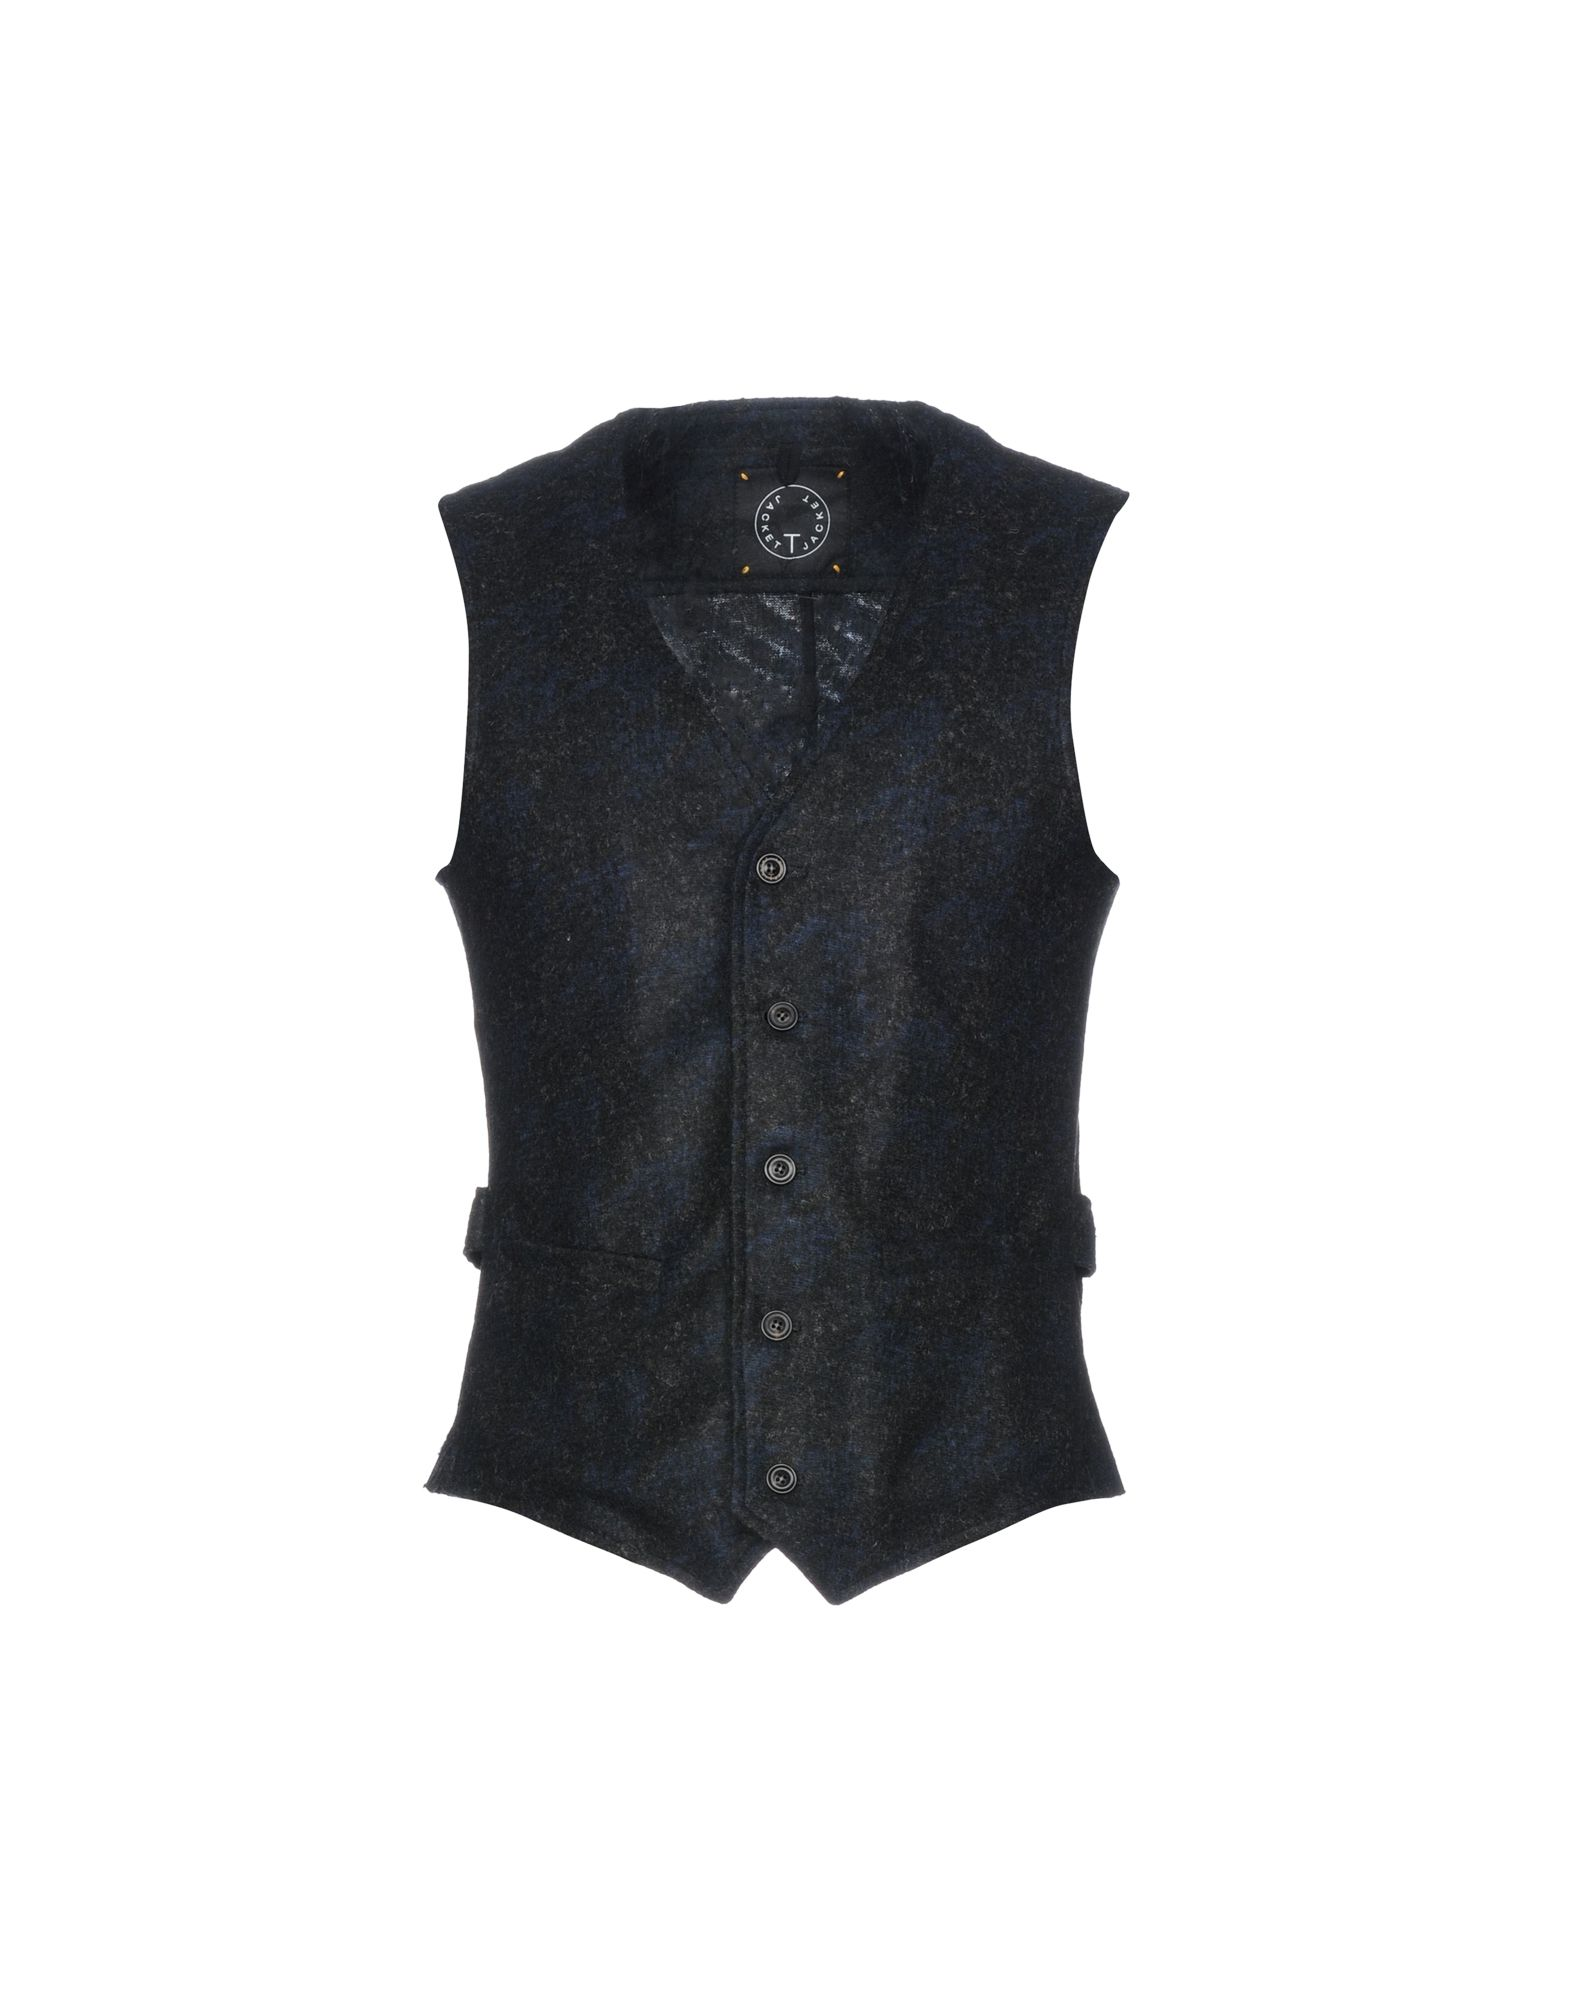 T-JACKET by TONELLO Жилет jacket baronia jacket